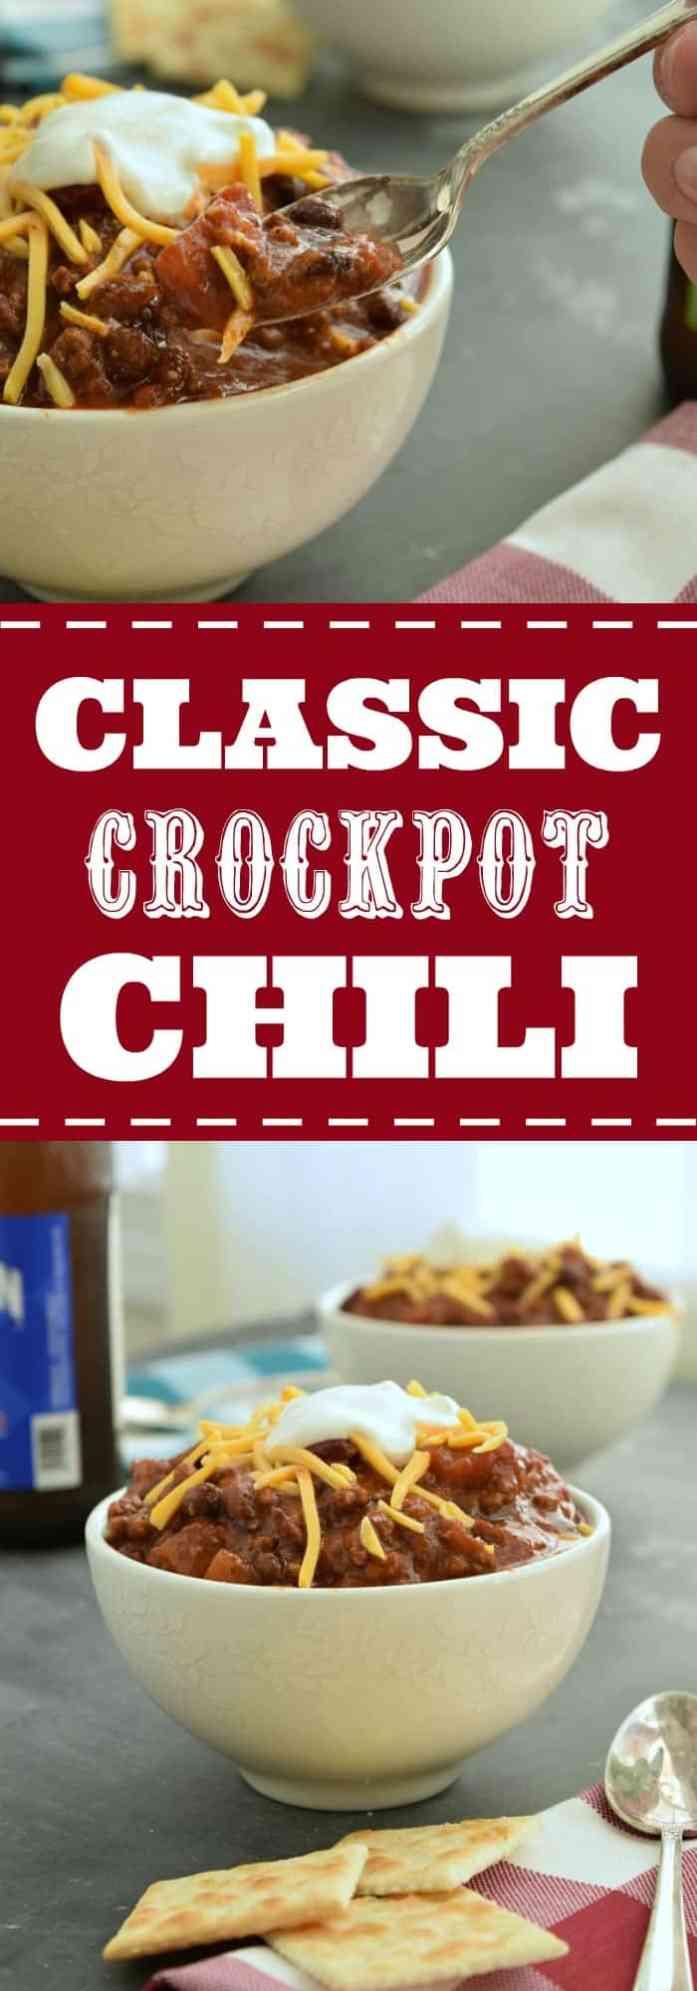 Classic Crockpot Chili